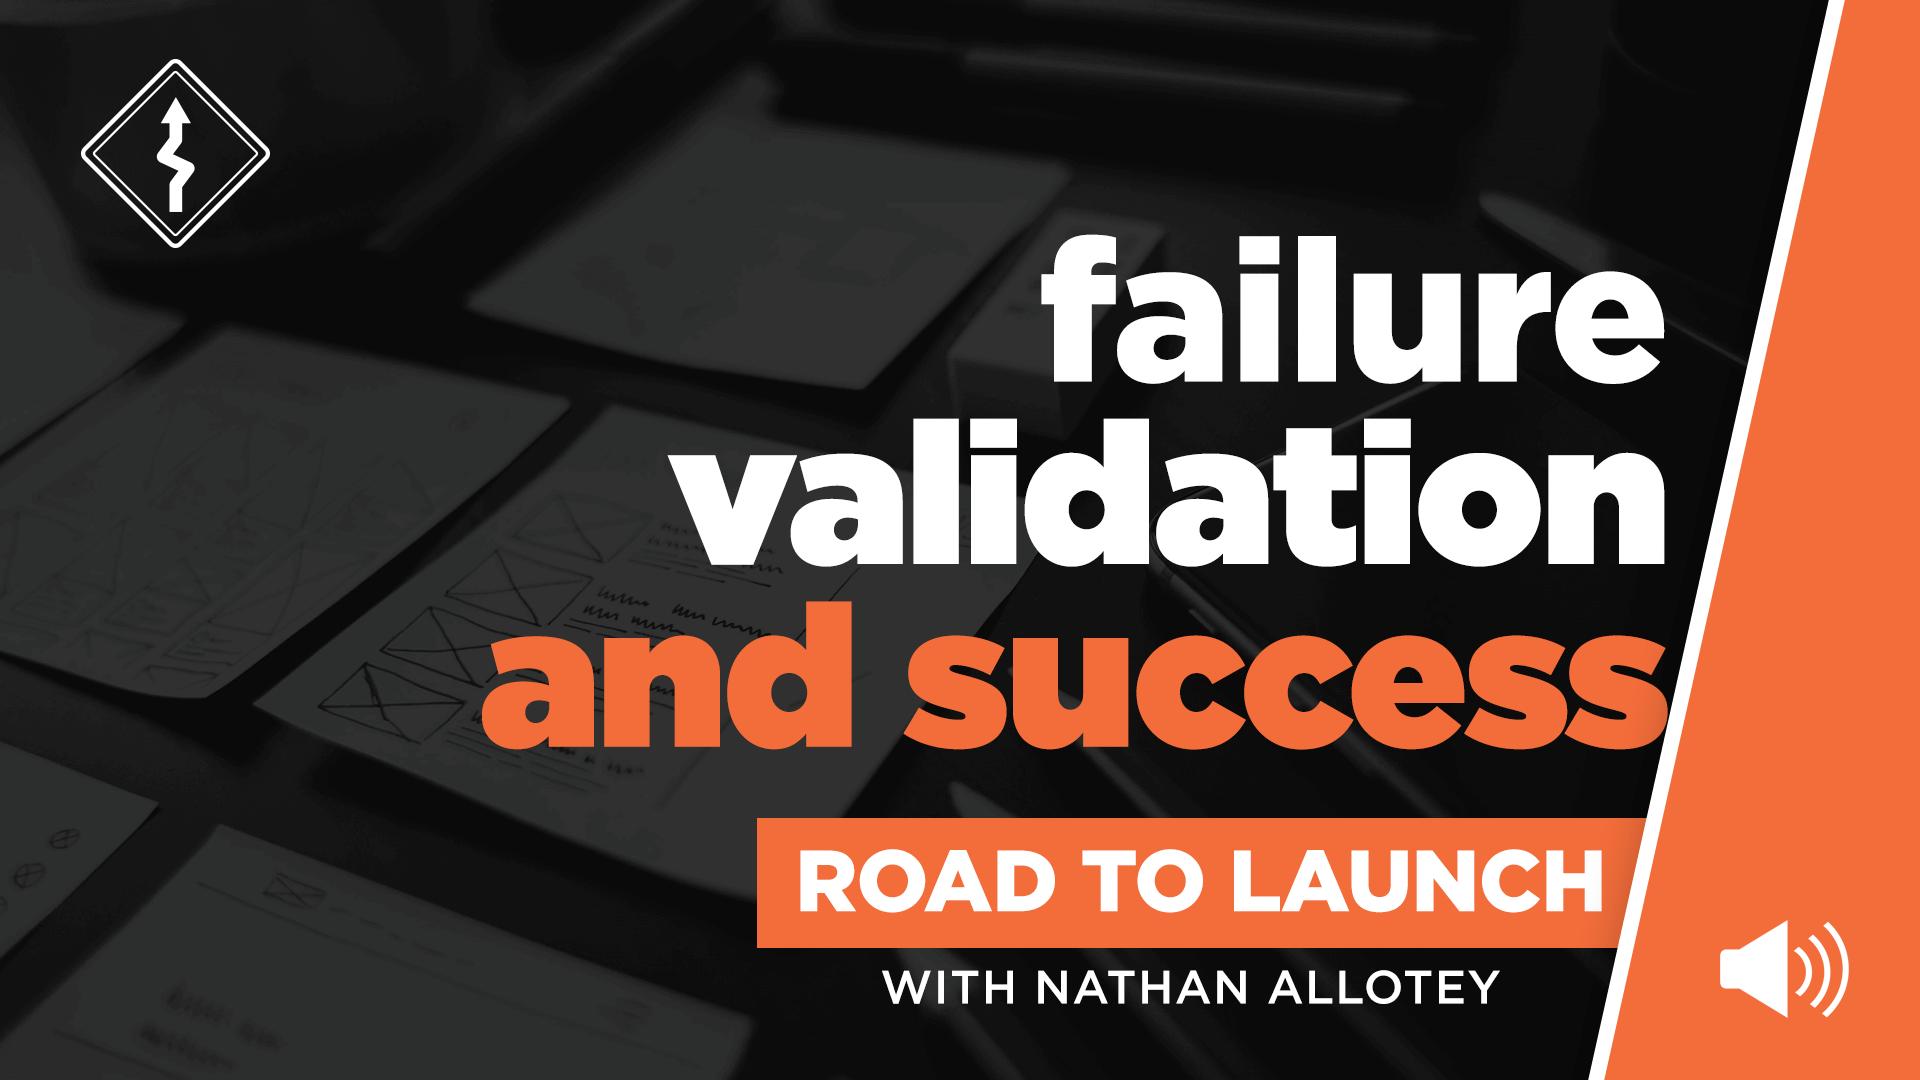 003-failure-validation-success